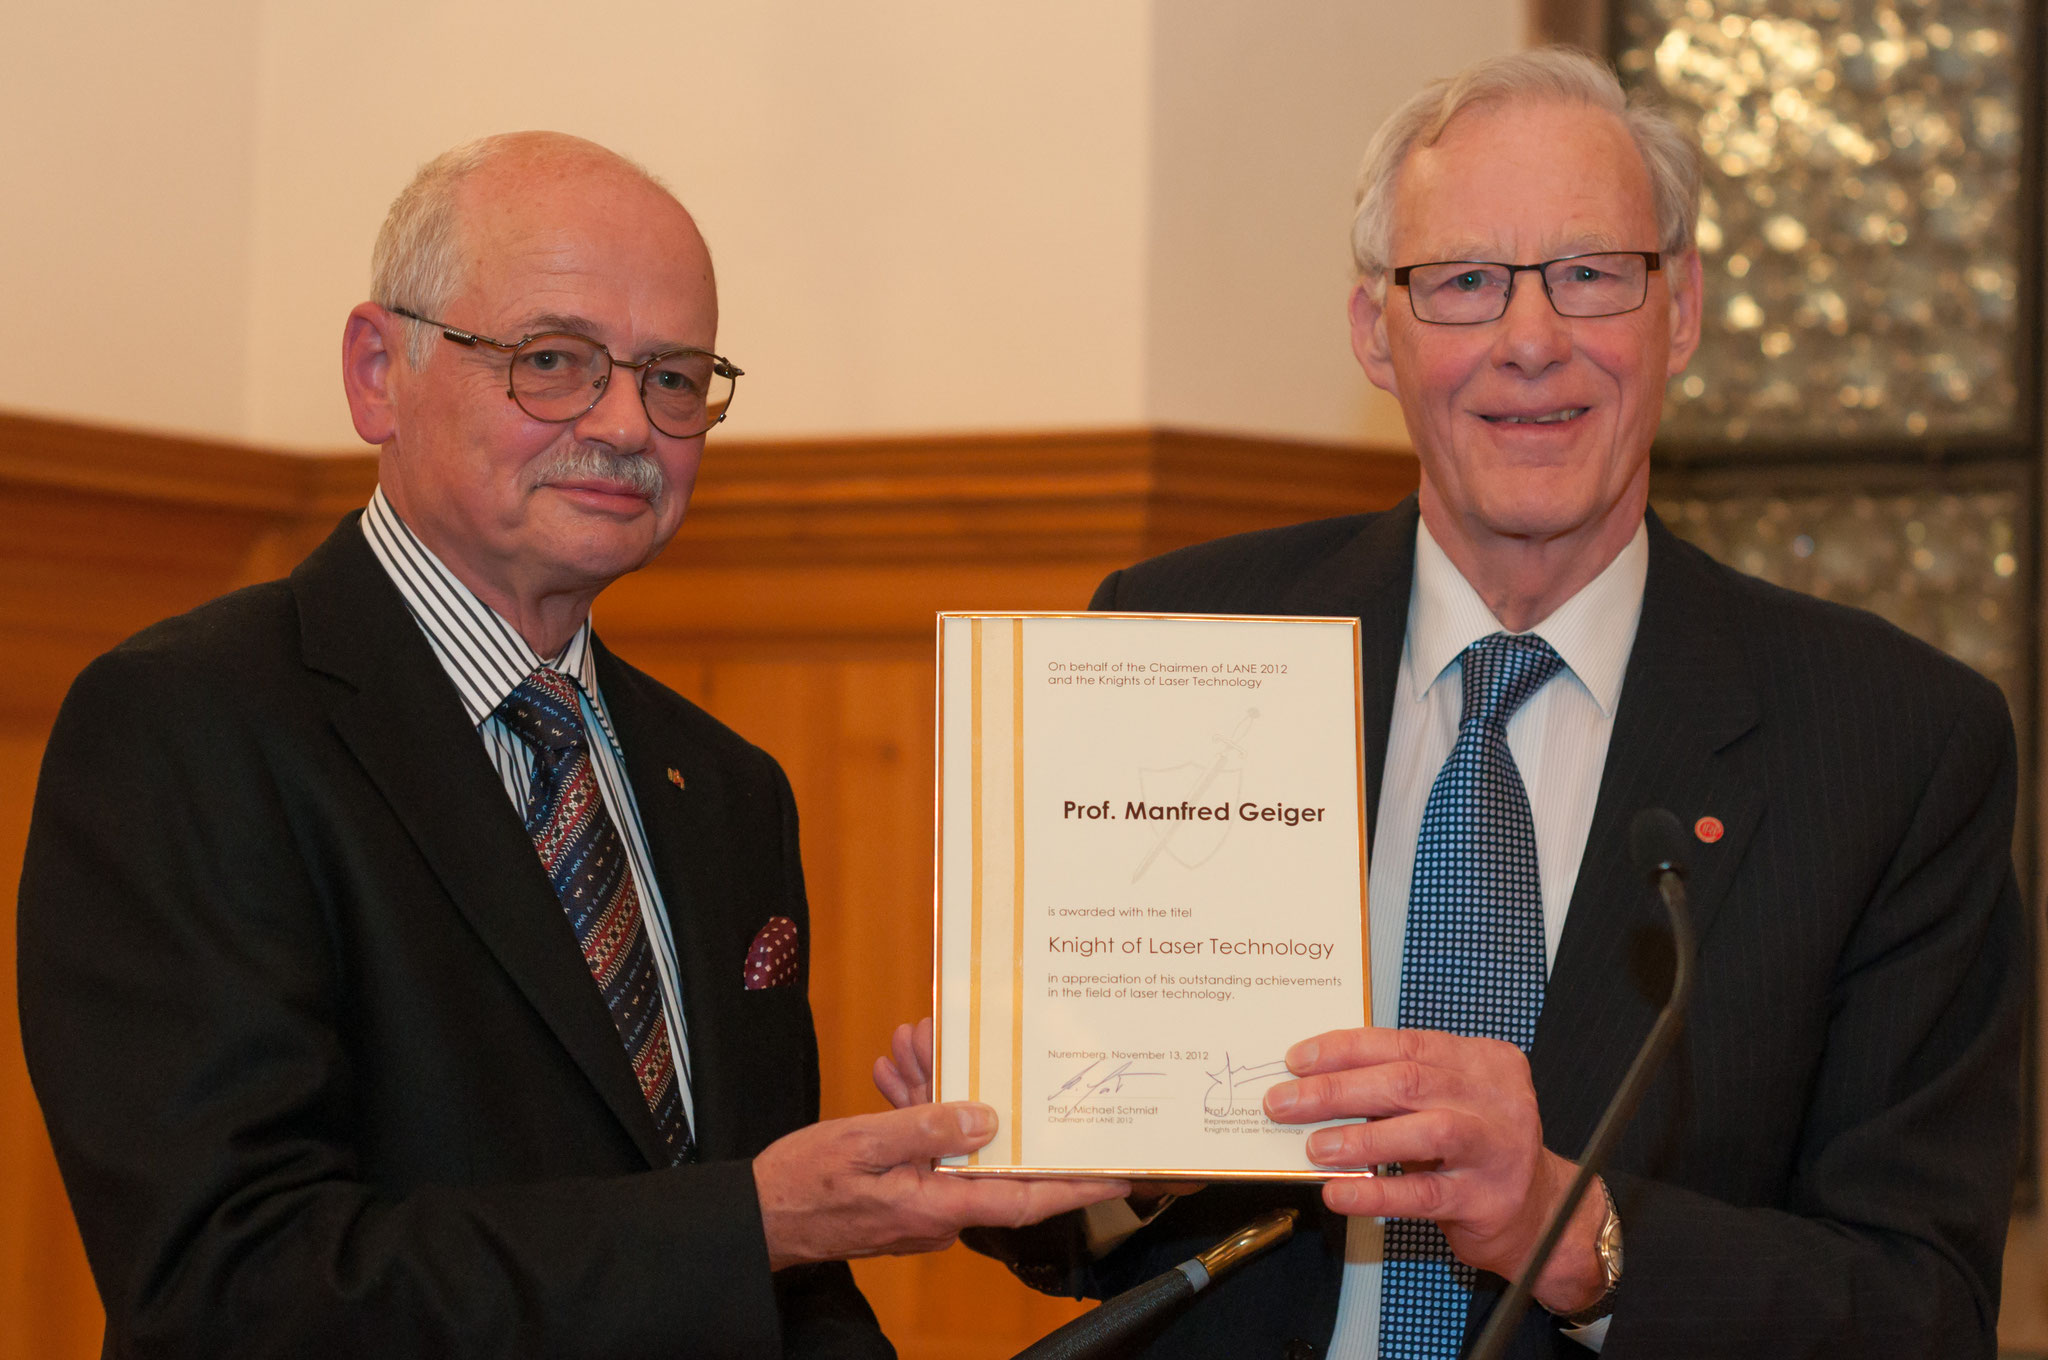 Prof. Manferd Geiger, Knight of Laser Technology 2012 (left) and Prof. Johan Meijer, Knight of Laser Technology 2010 (right)